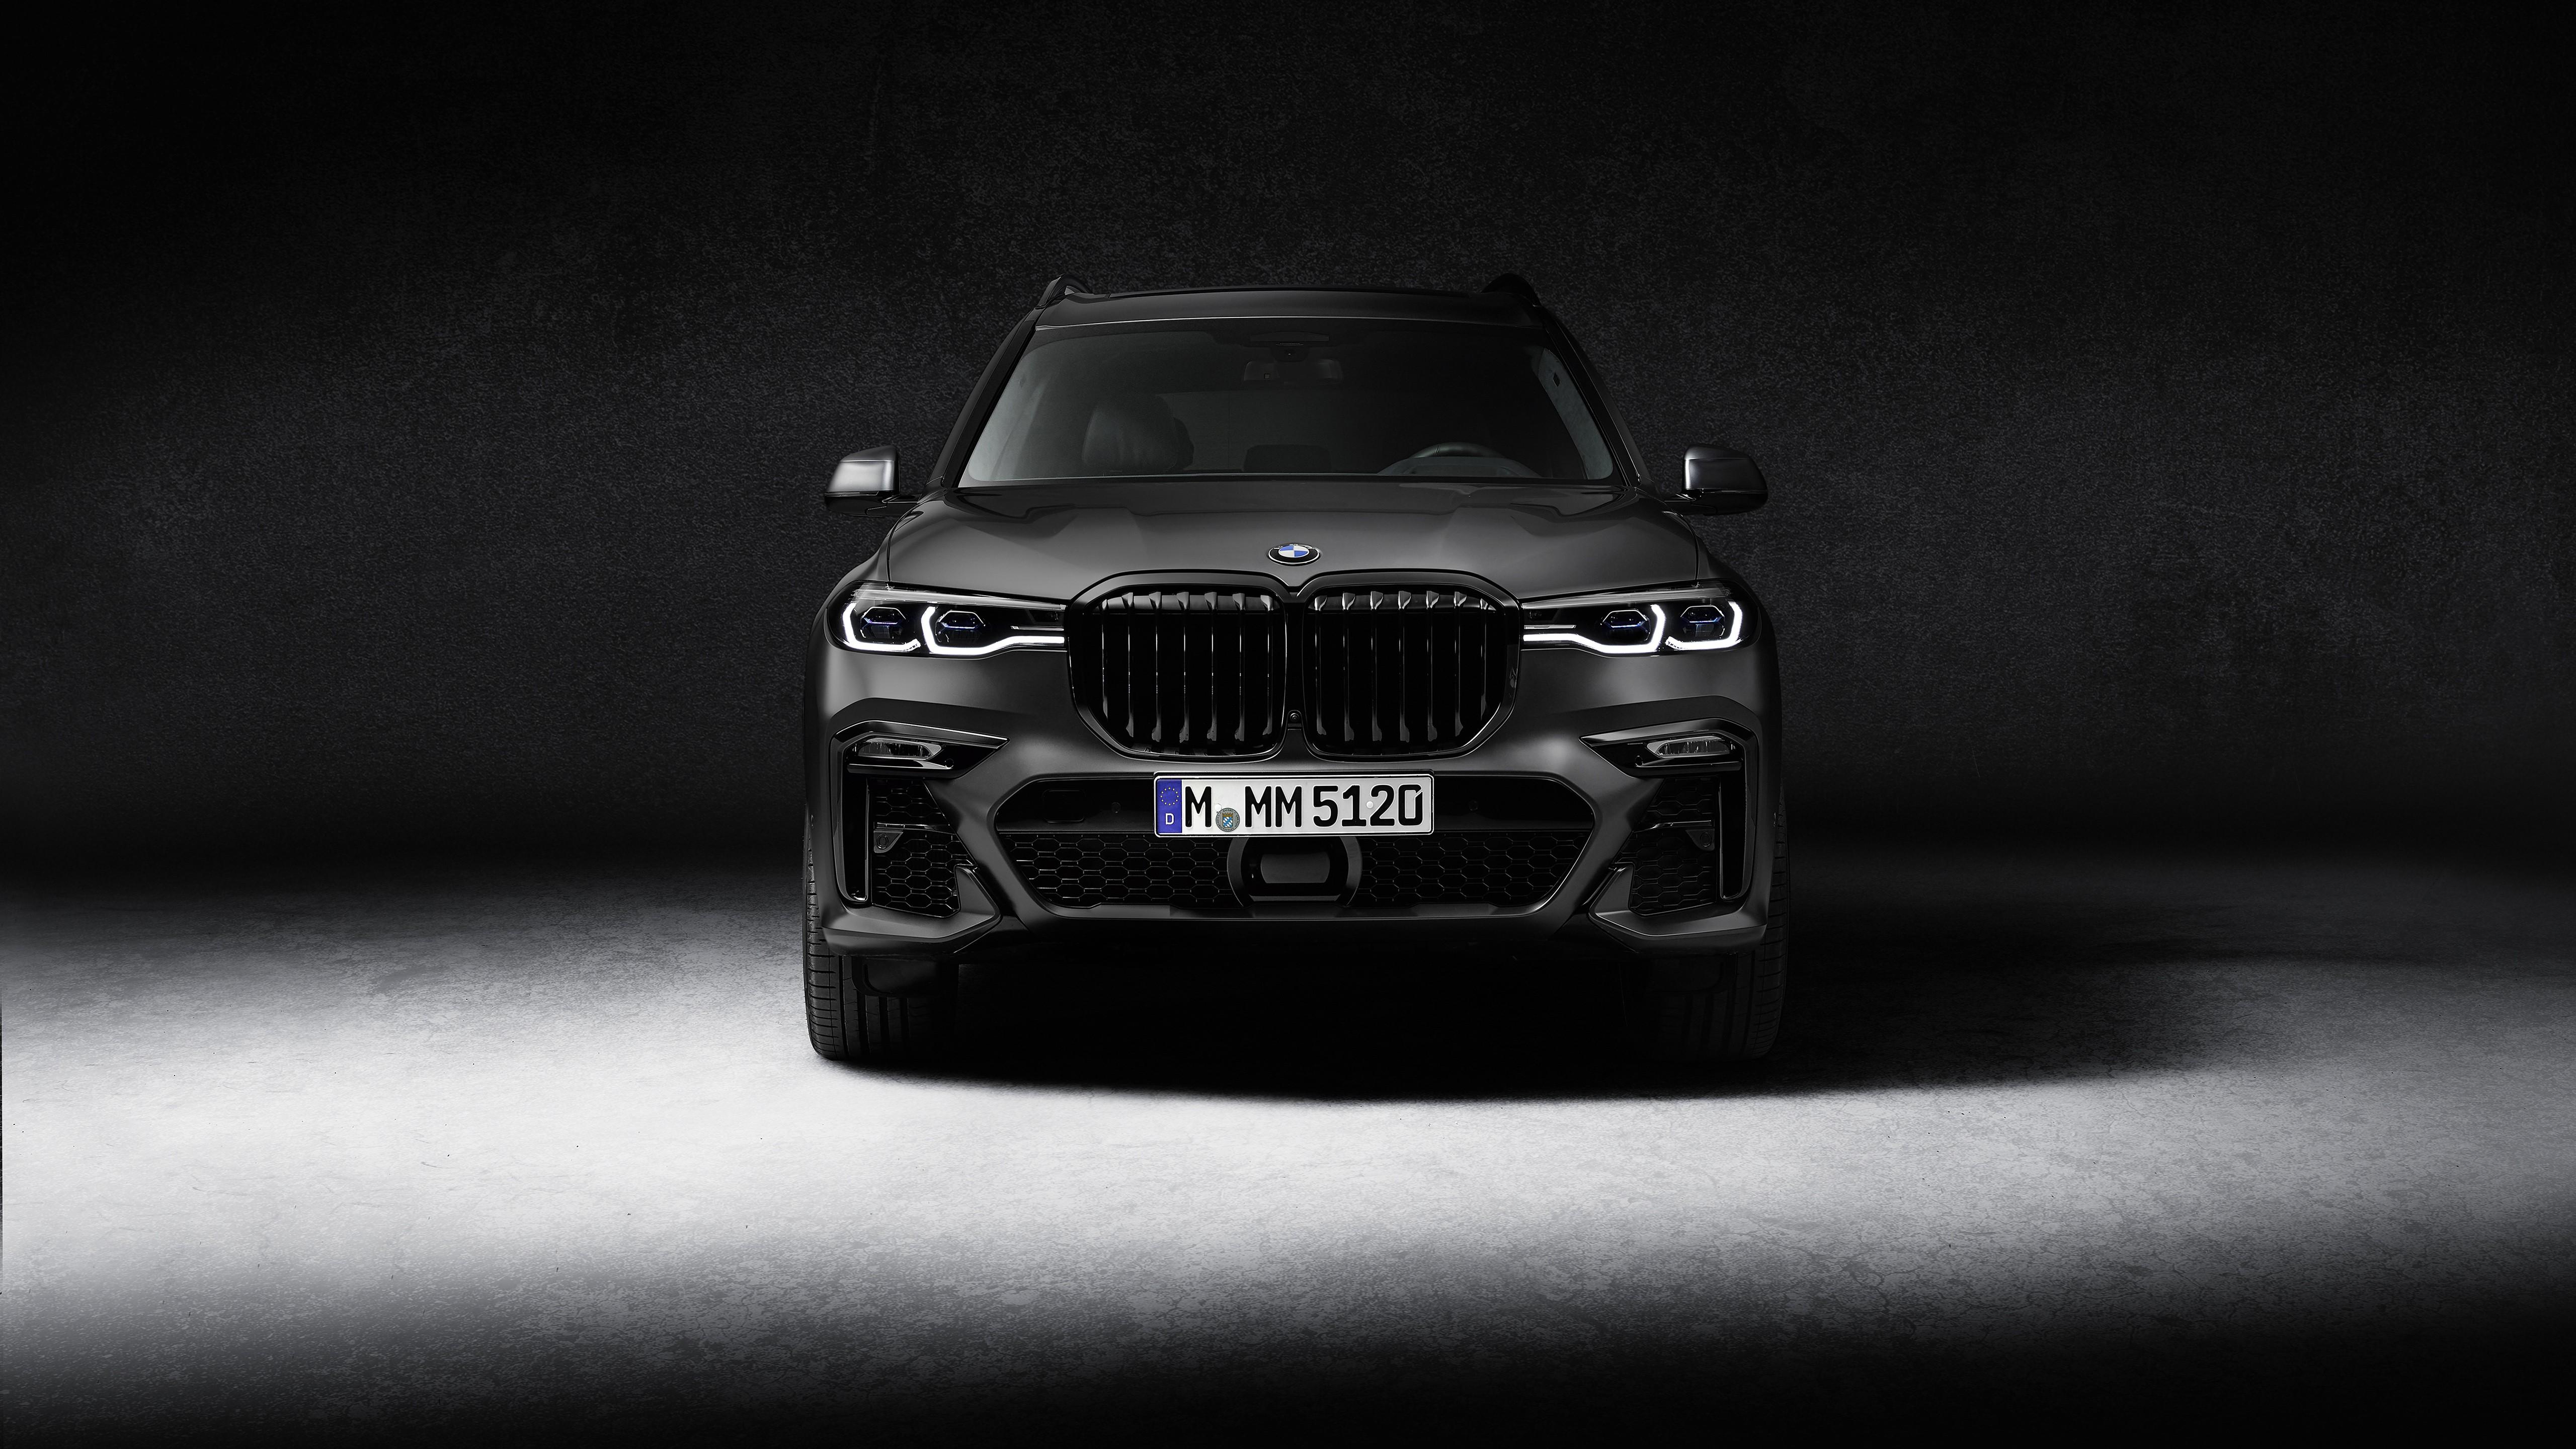 Bmw X7 M50i Edition Dark Shadow 2020 5k Wallpaper Hd Car Wallpapers Id 15369